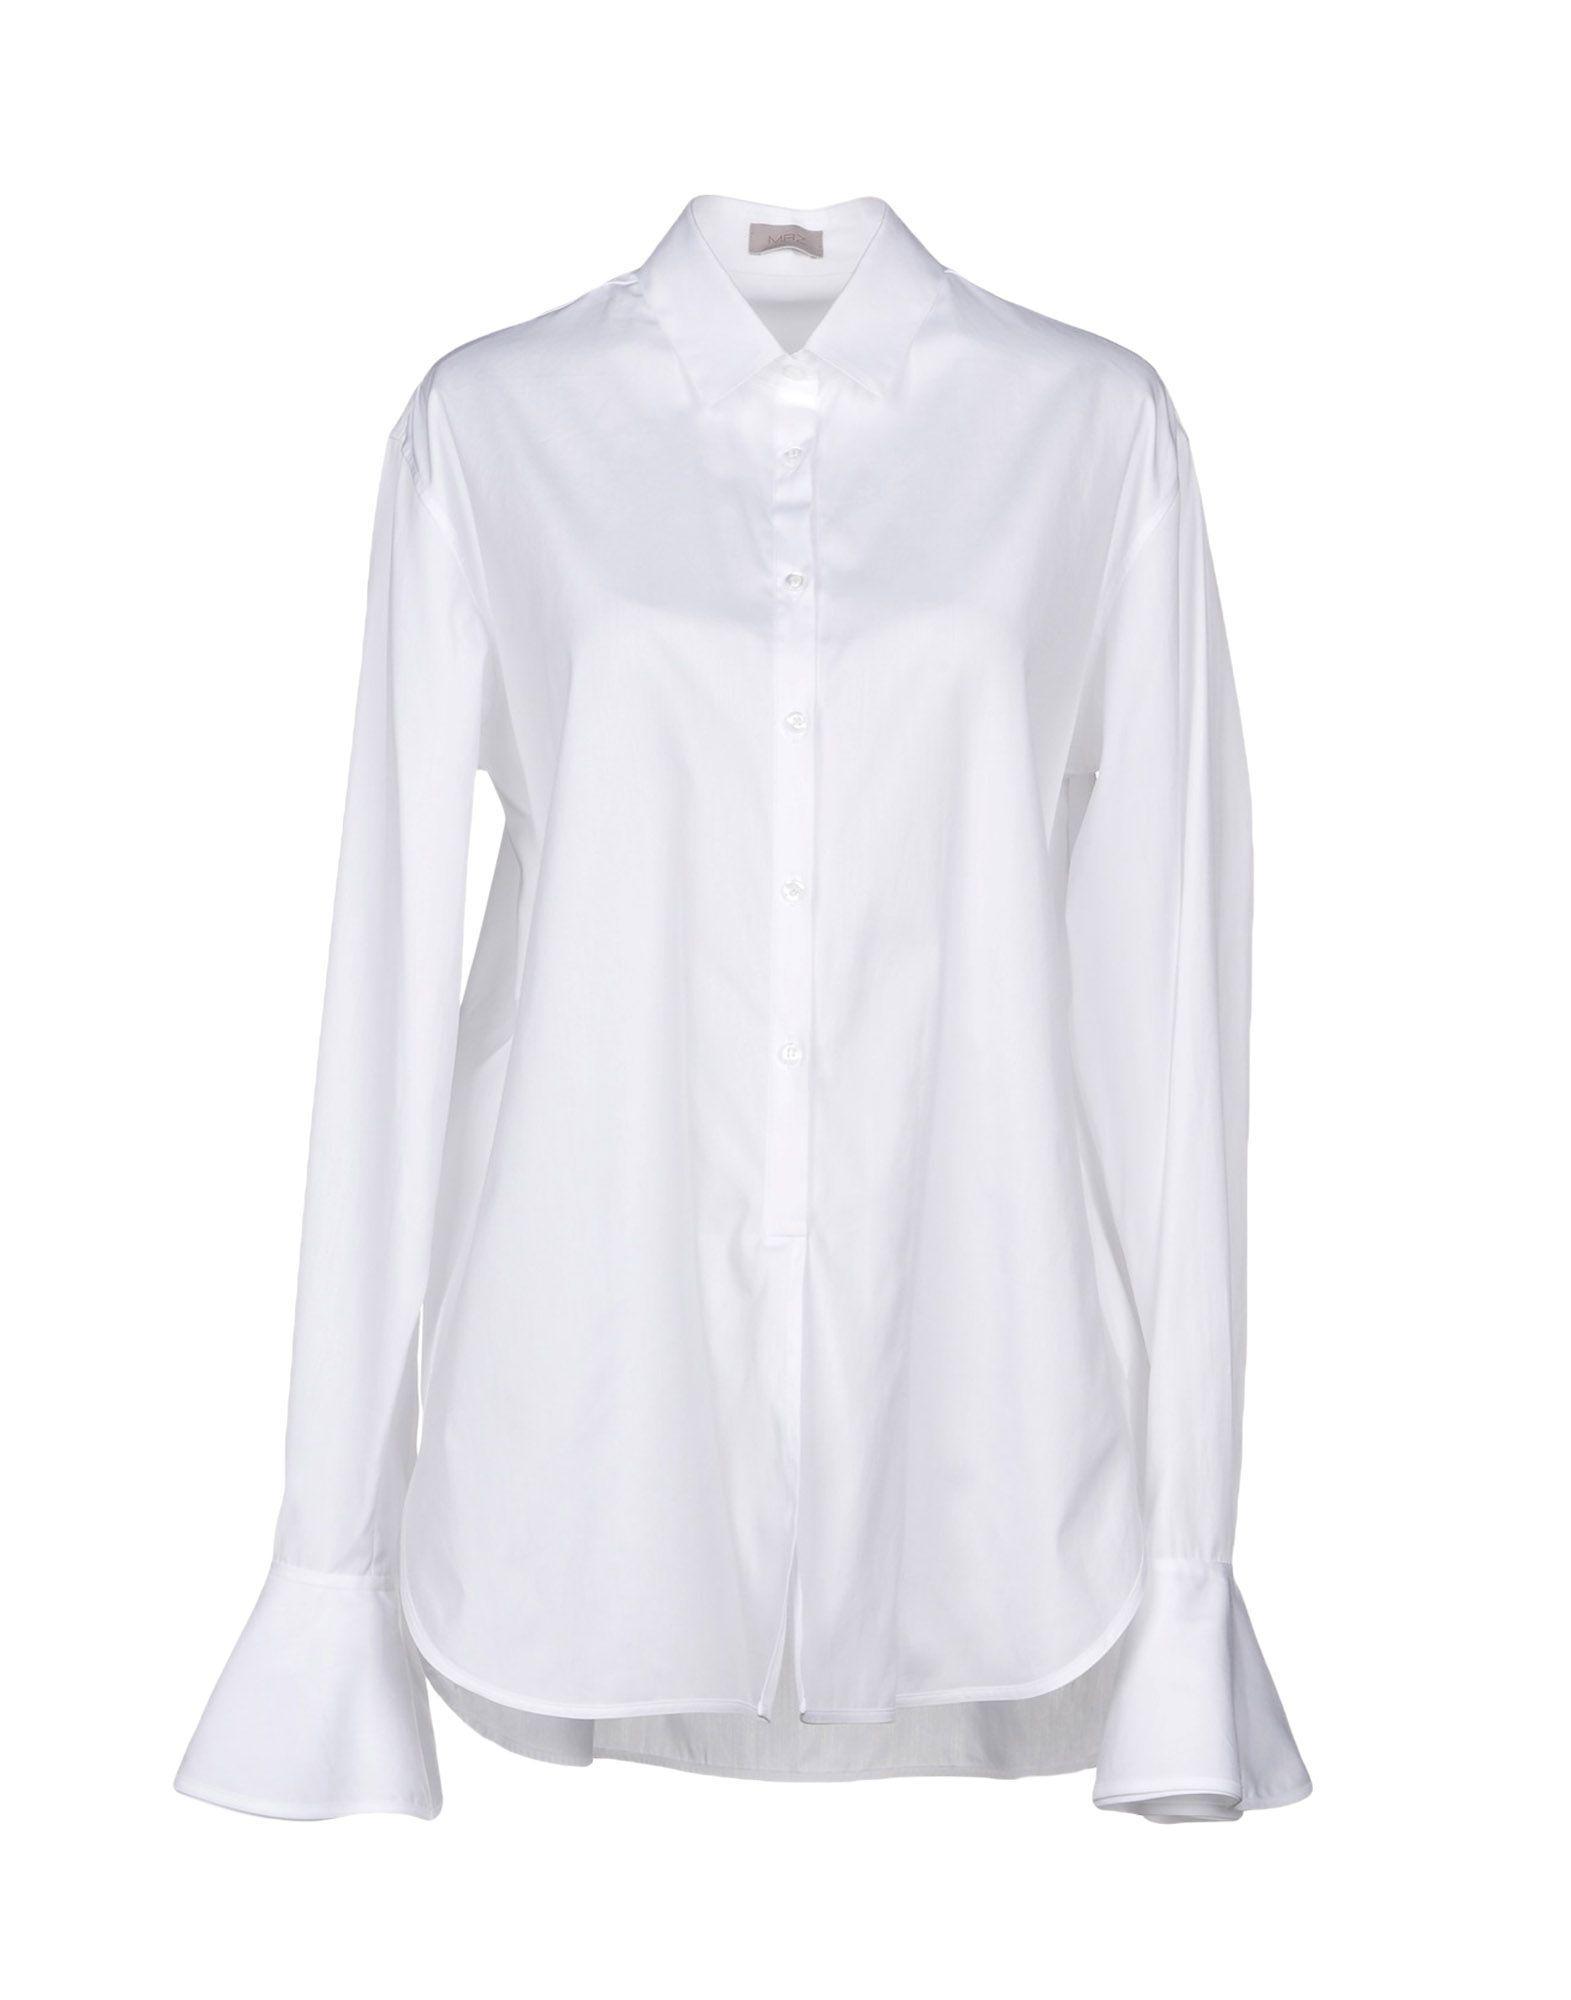 SHIRTS - Shirts MRZ Good Selling Huge Surprise Online Buy Cheap Pre Order oyQJR